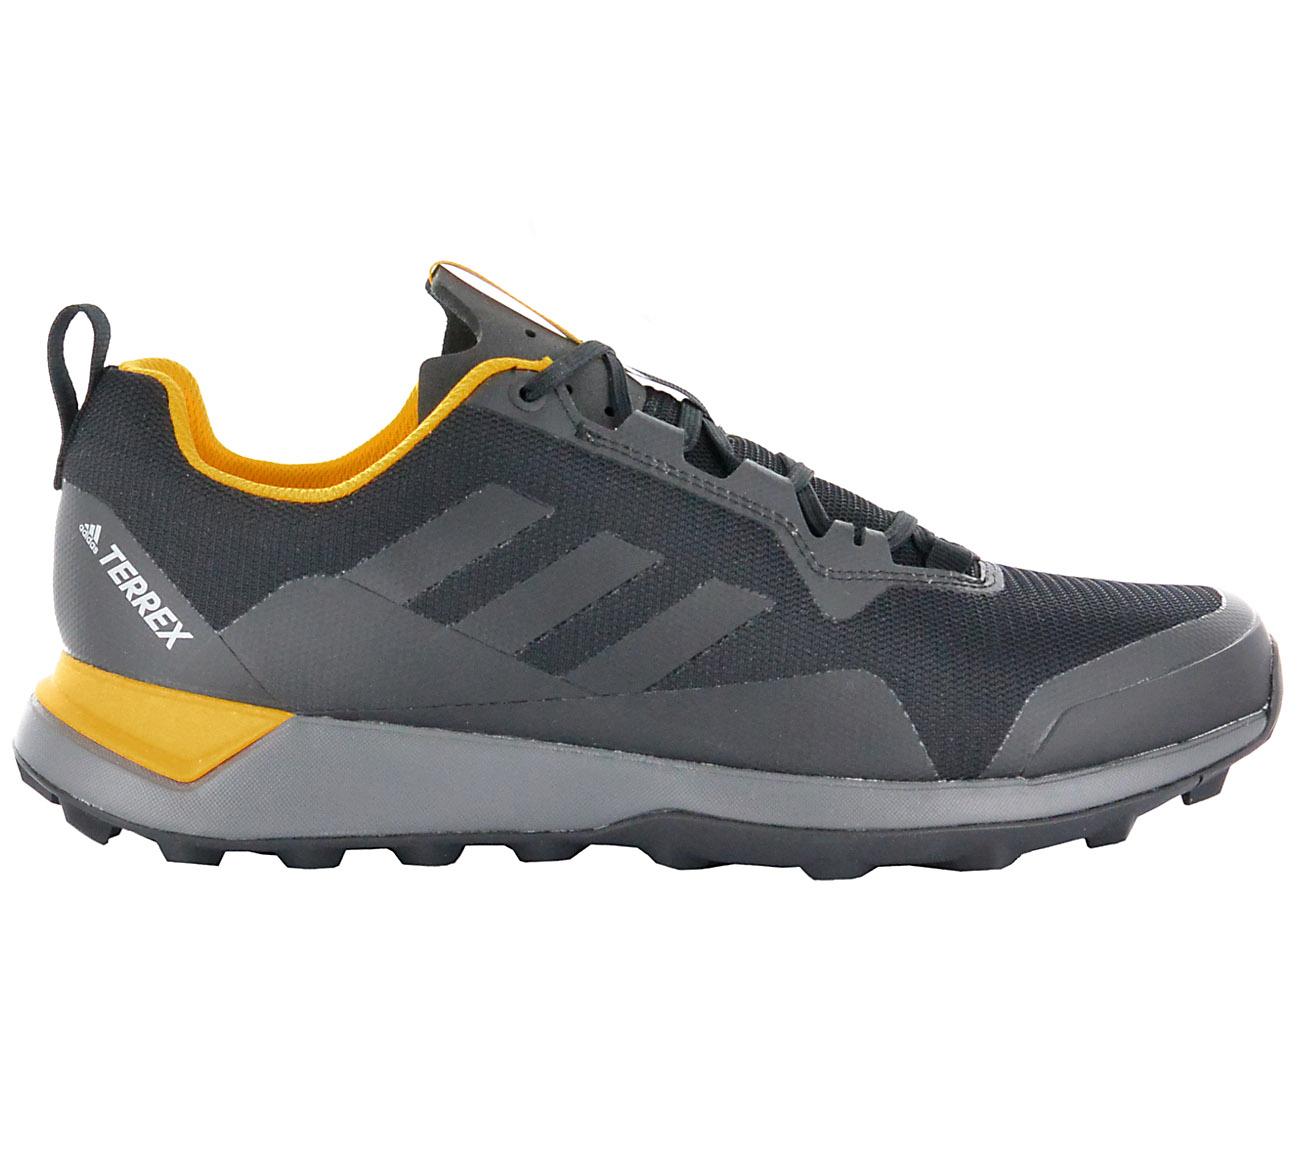 adidas-Herren-Wanderschuhe-Terrex-AX2-Gore-Tex-Outdoor-Trekking-Schuhe-Bergschuh